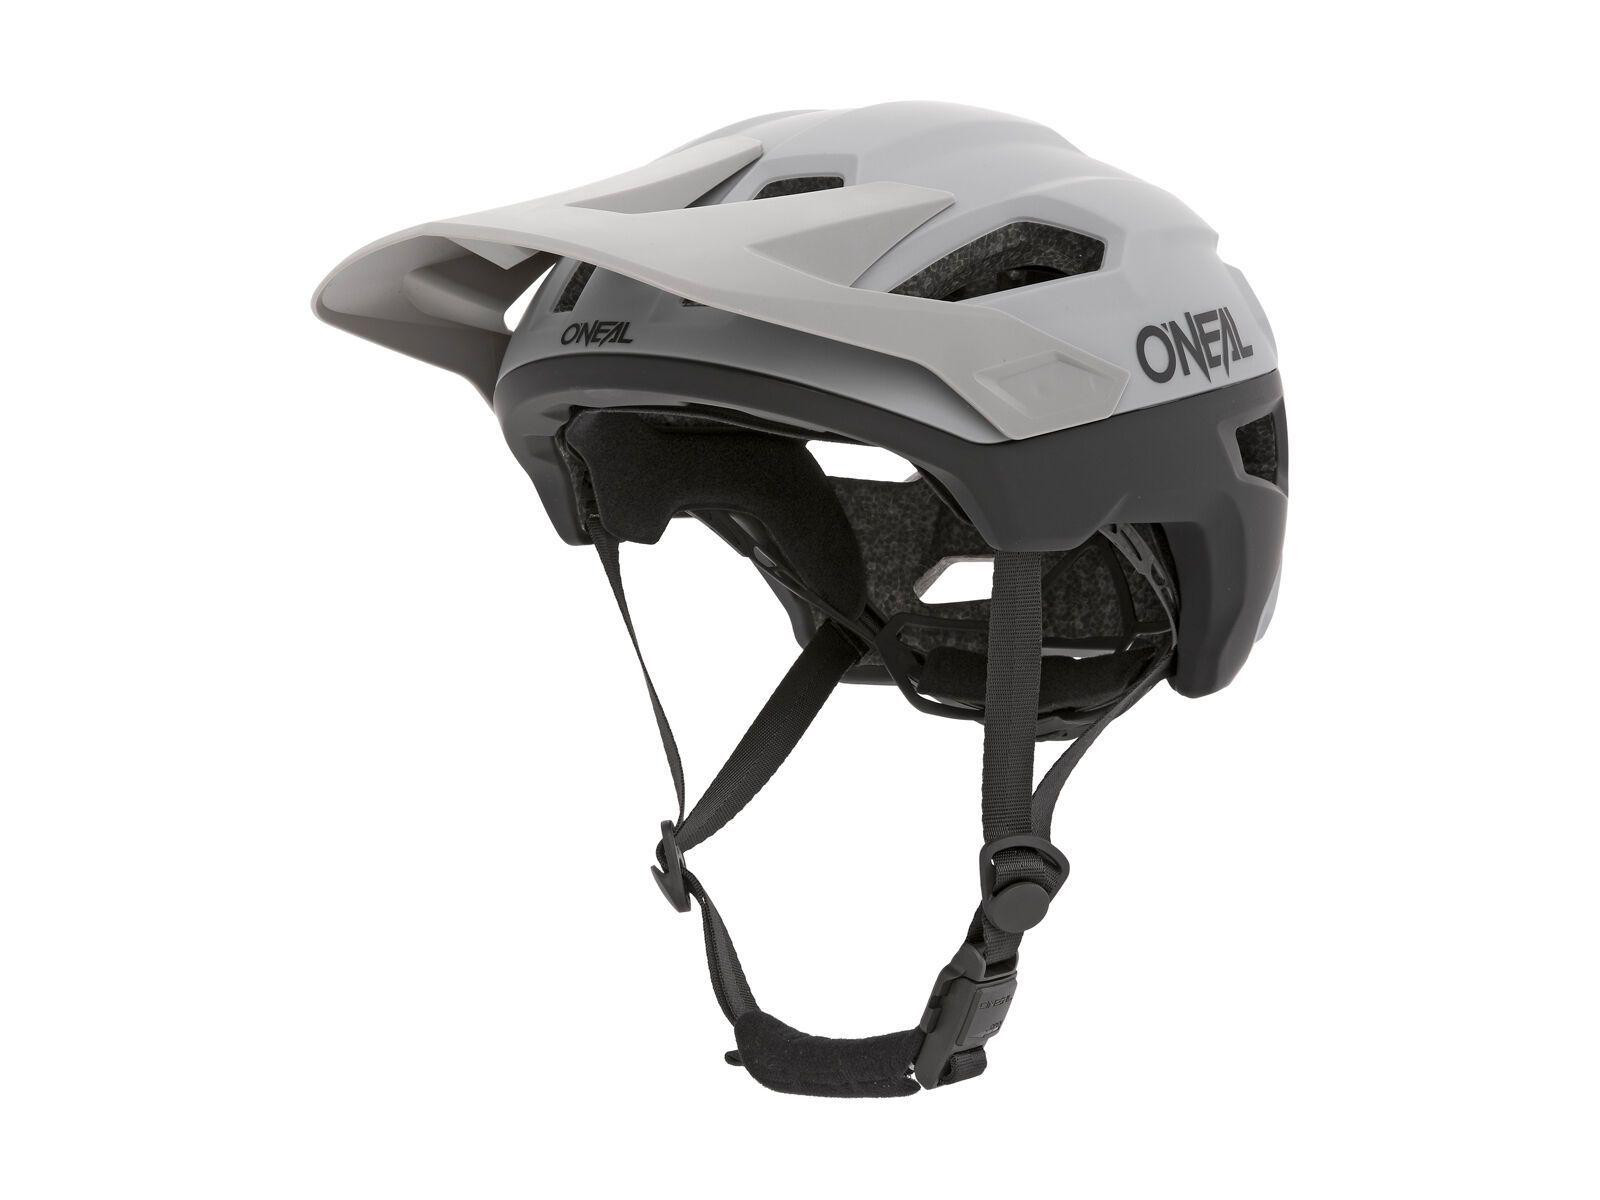 ONeal Trailfinder Helmet Split gray L/XL // 59-63 cm 0013-404